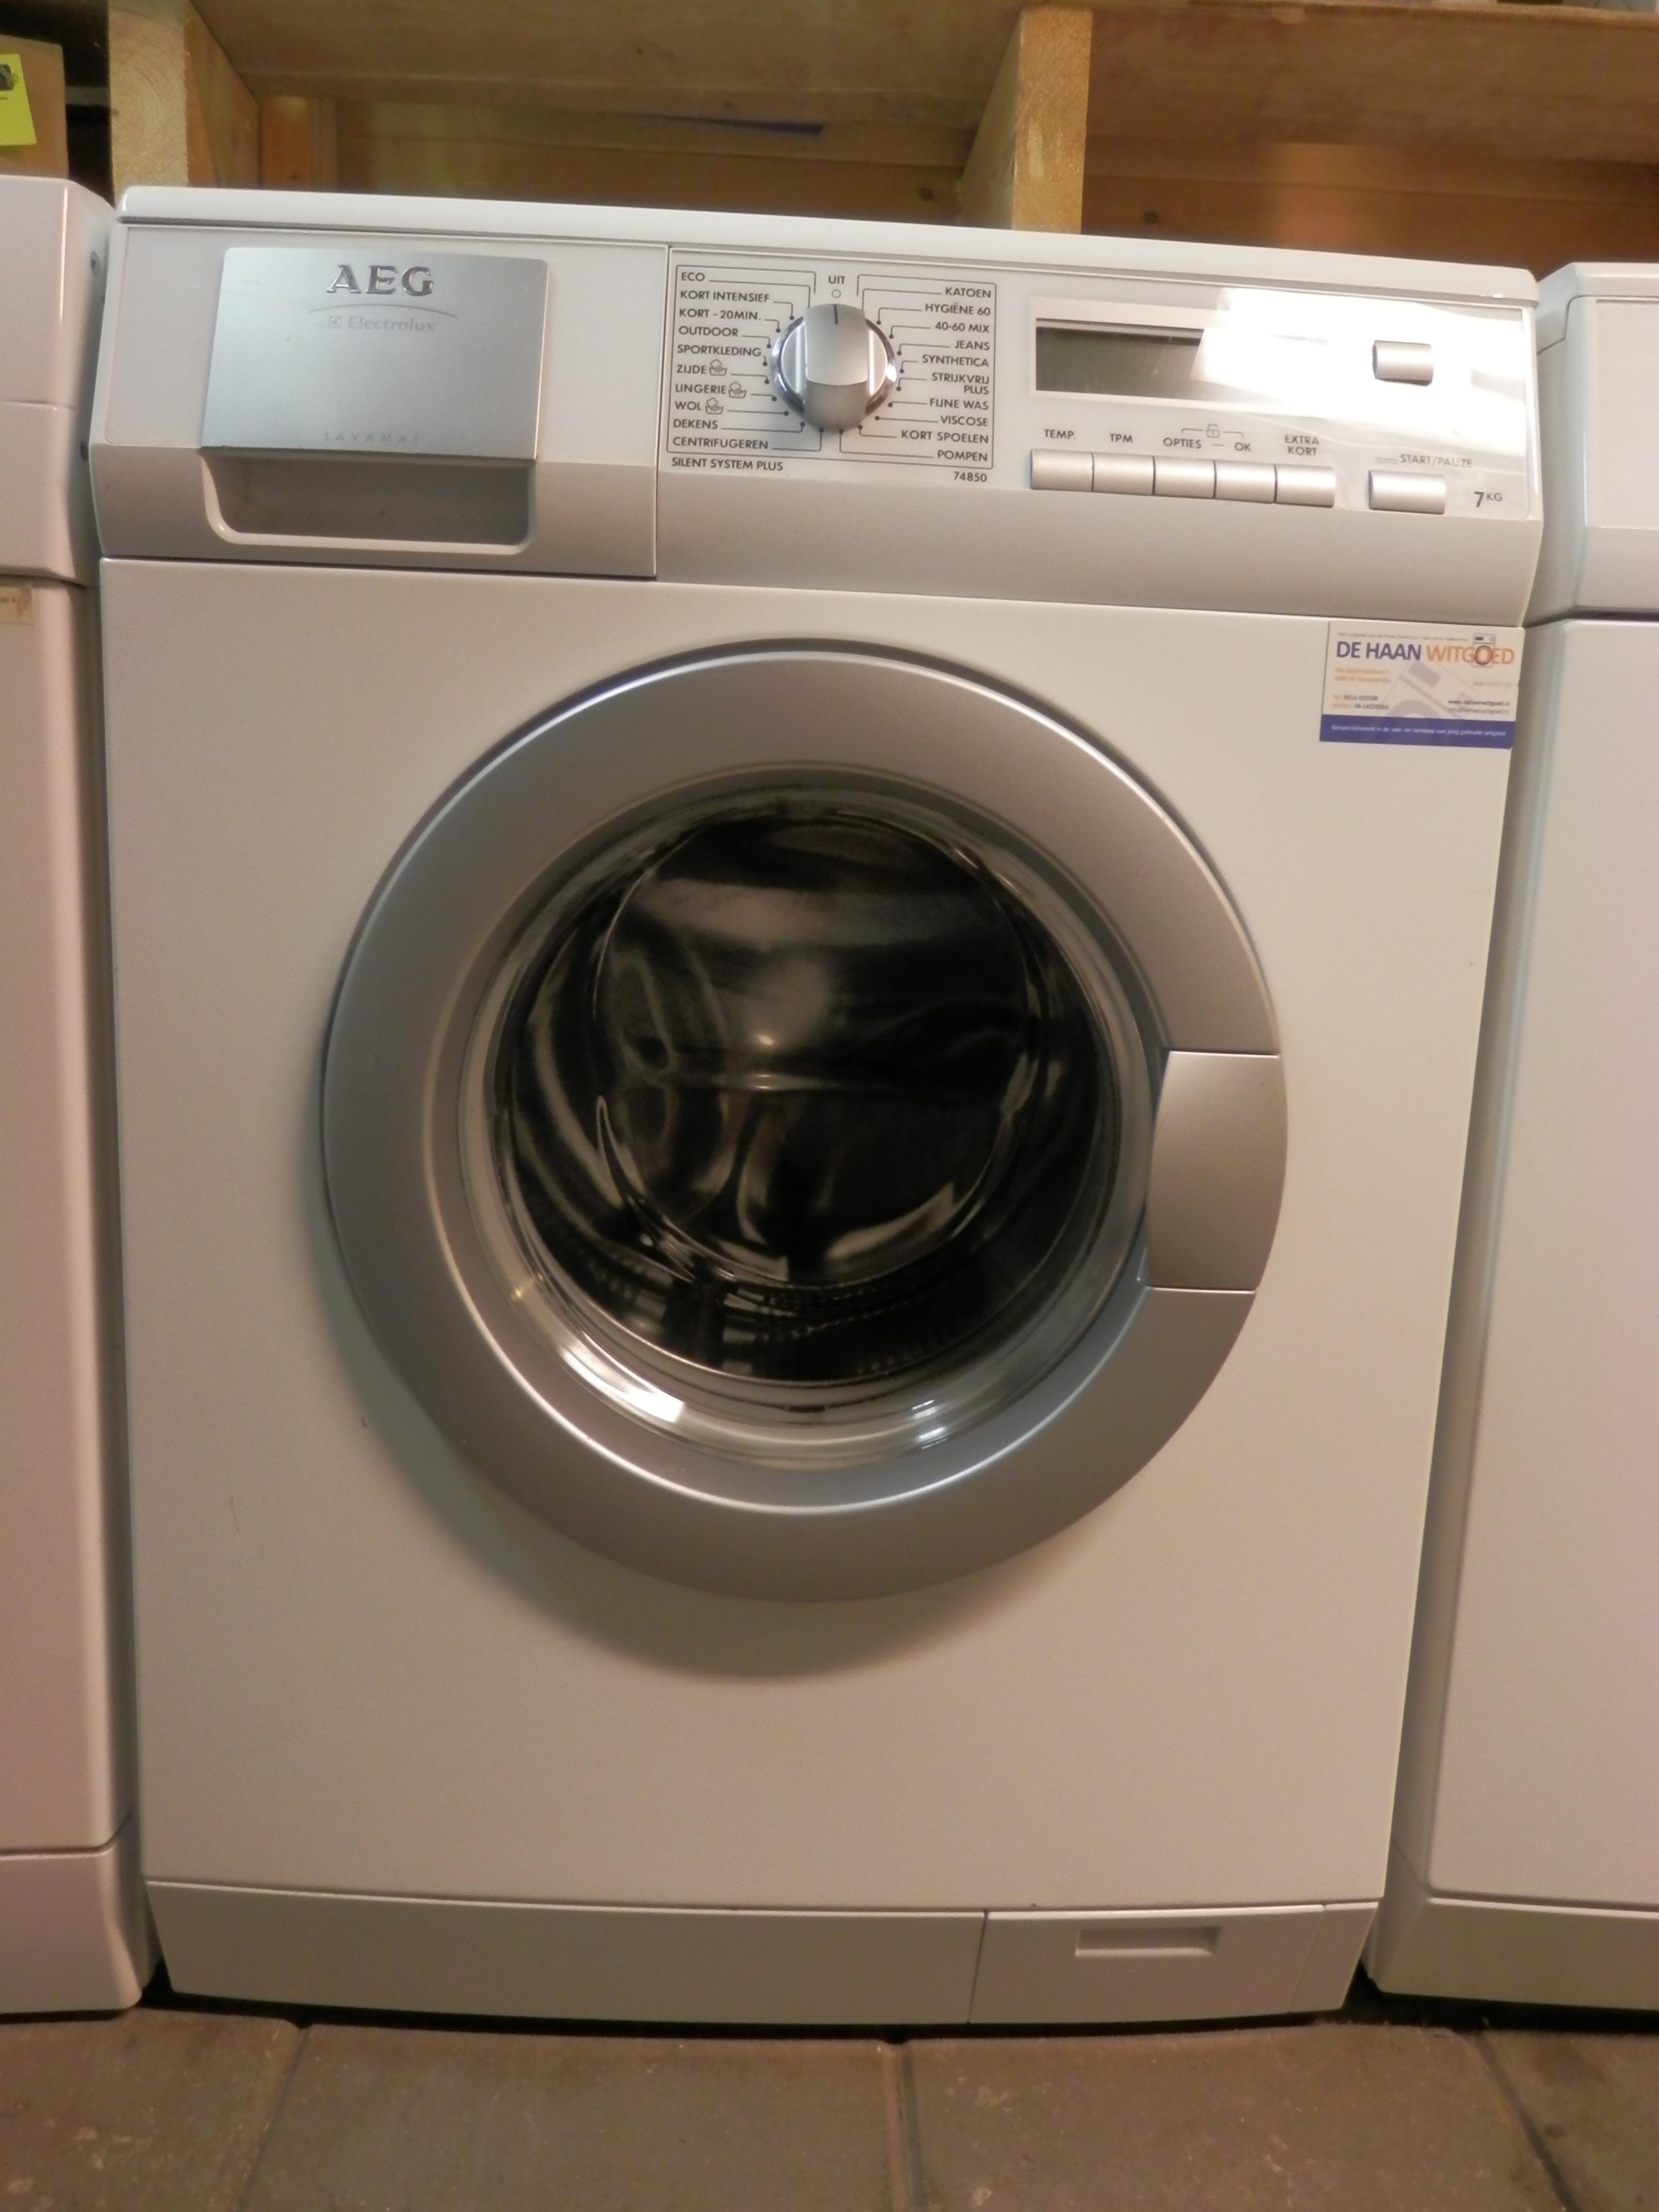 tweedehands aeg electrolux lavamat 74850 tweedehands wasmachines de haan witgoed friesland. Black Bedroom Furniture Sets. Home Design Ideas